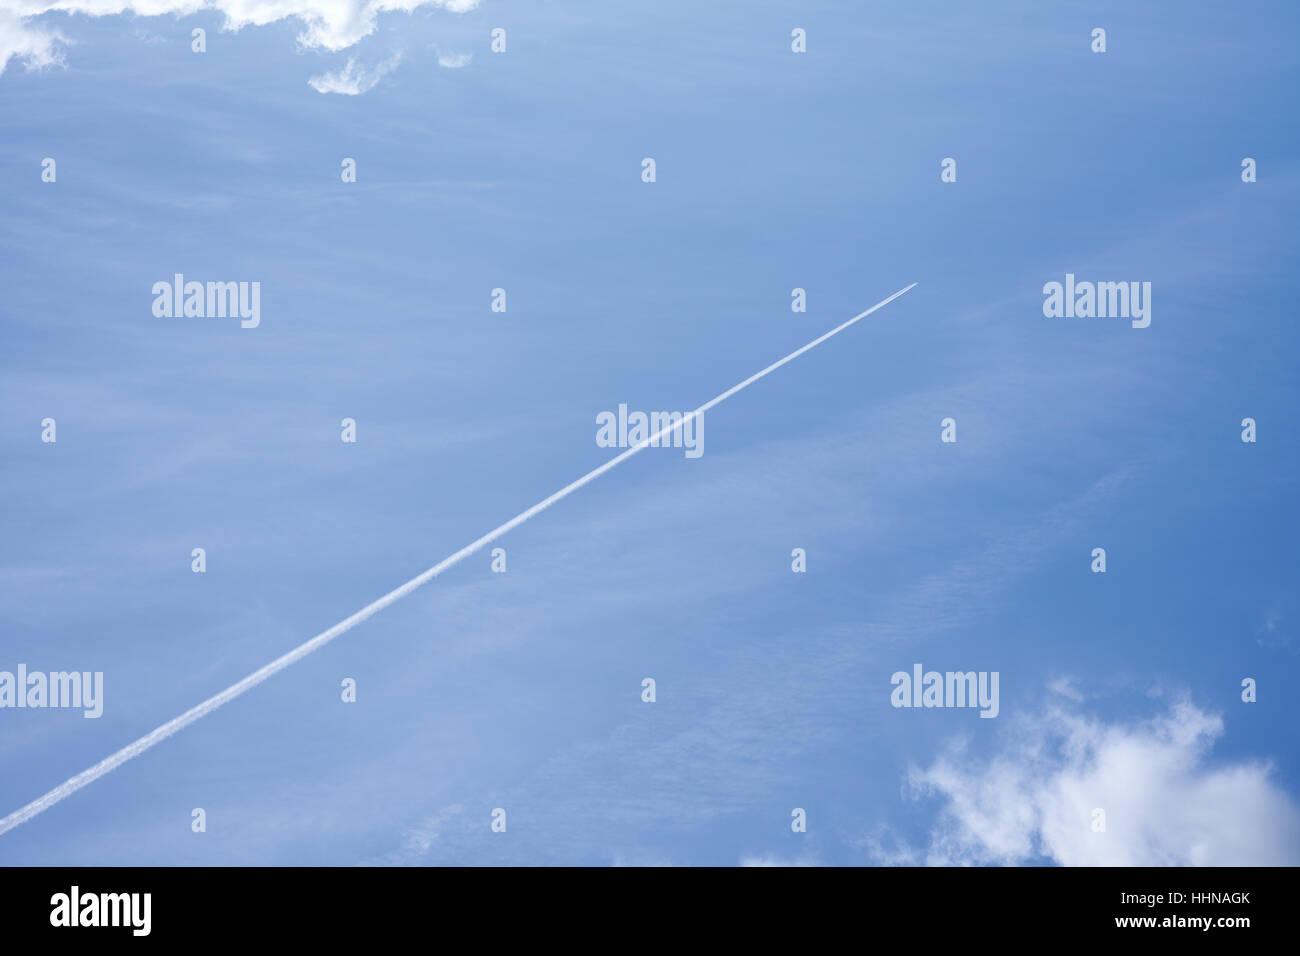 blue, cloud, trail, smudge, firmament, sky, aircraft, aeroplane, plane, - Stock Image